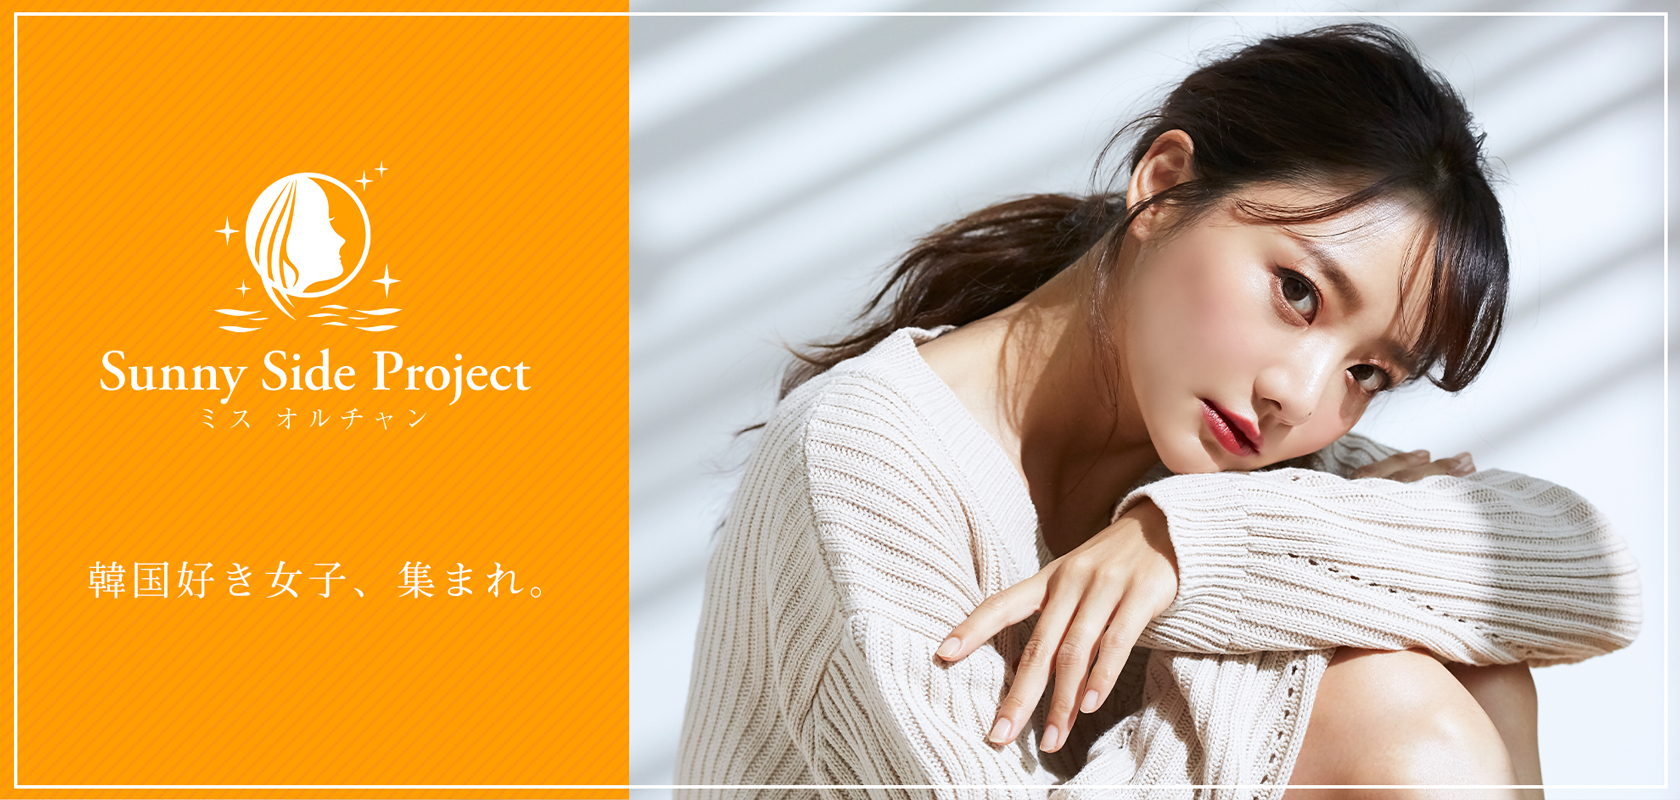 SunnySideProject~ミス・オルチャン~メイン画像